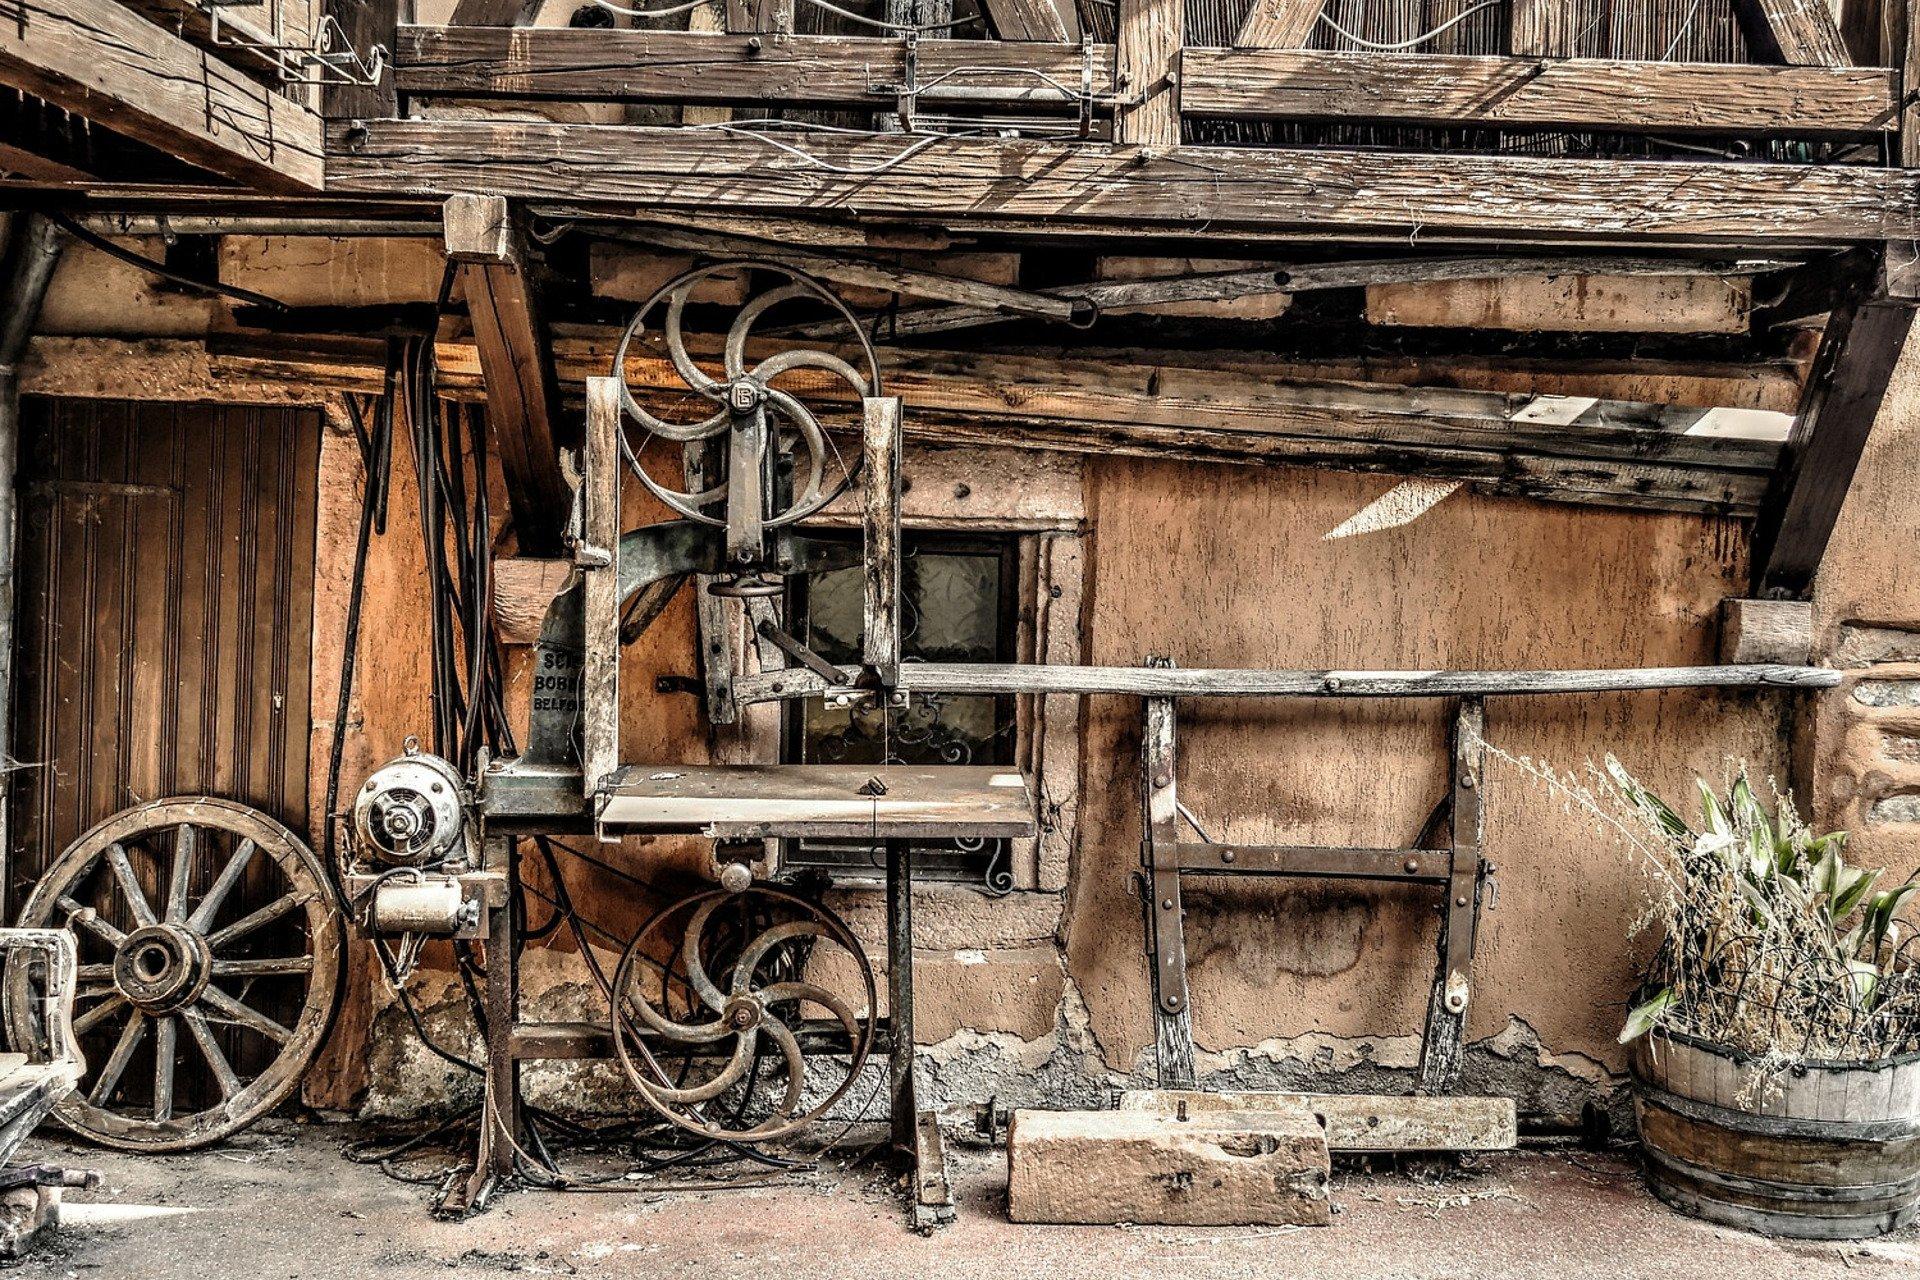 visite privée-artisanat-Colmar-Alsace-France